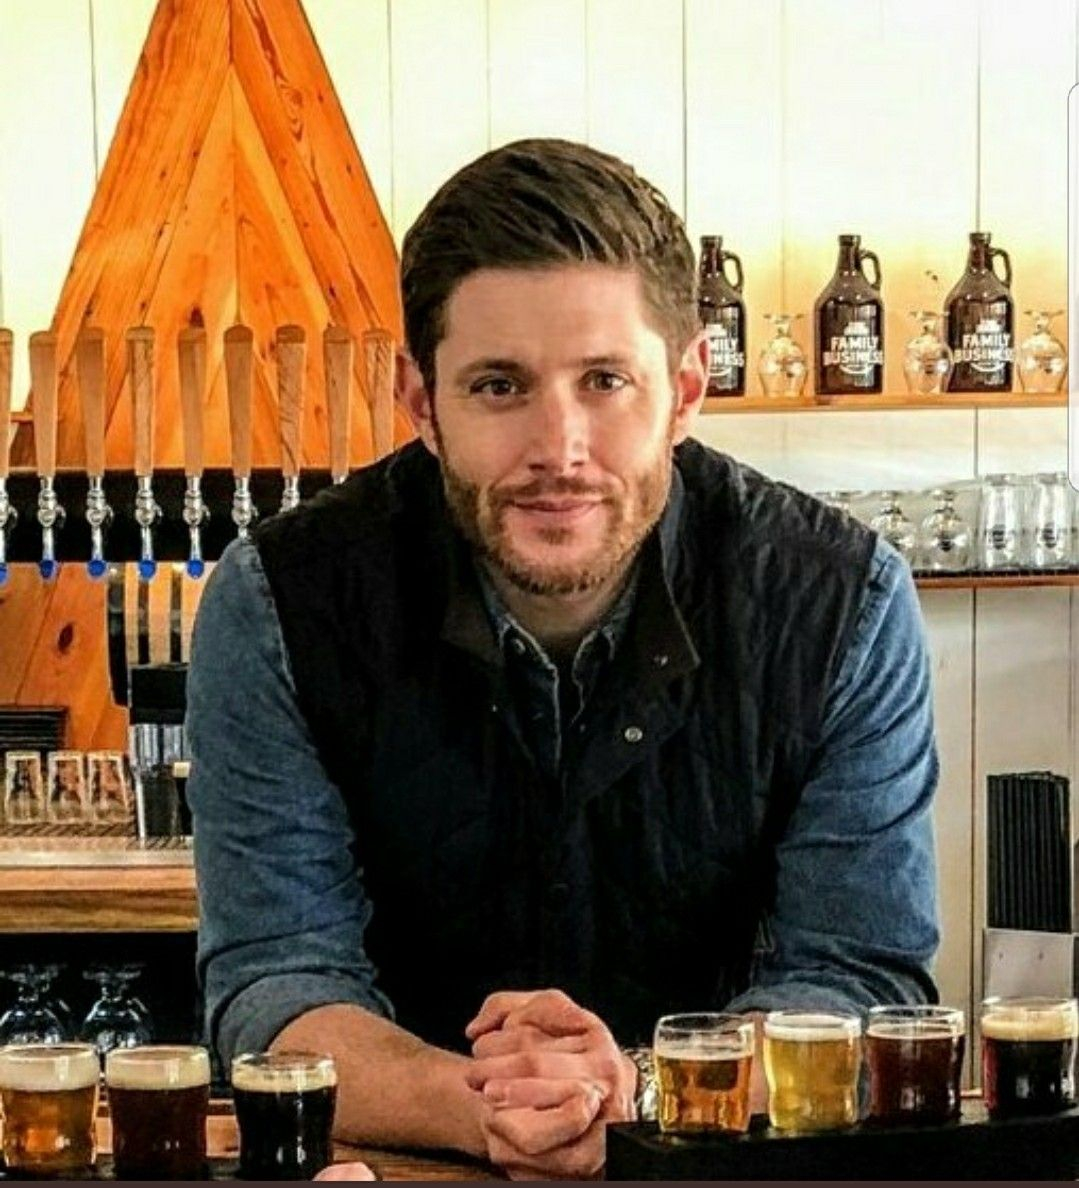 I'm so proud of Jensen...